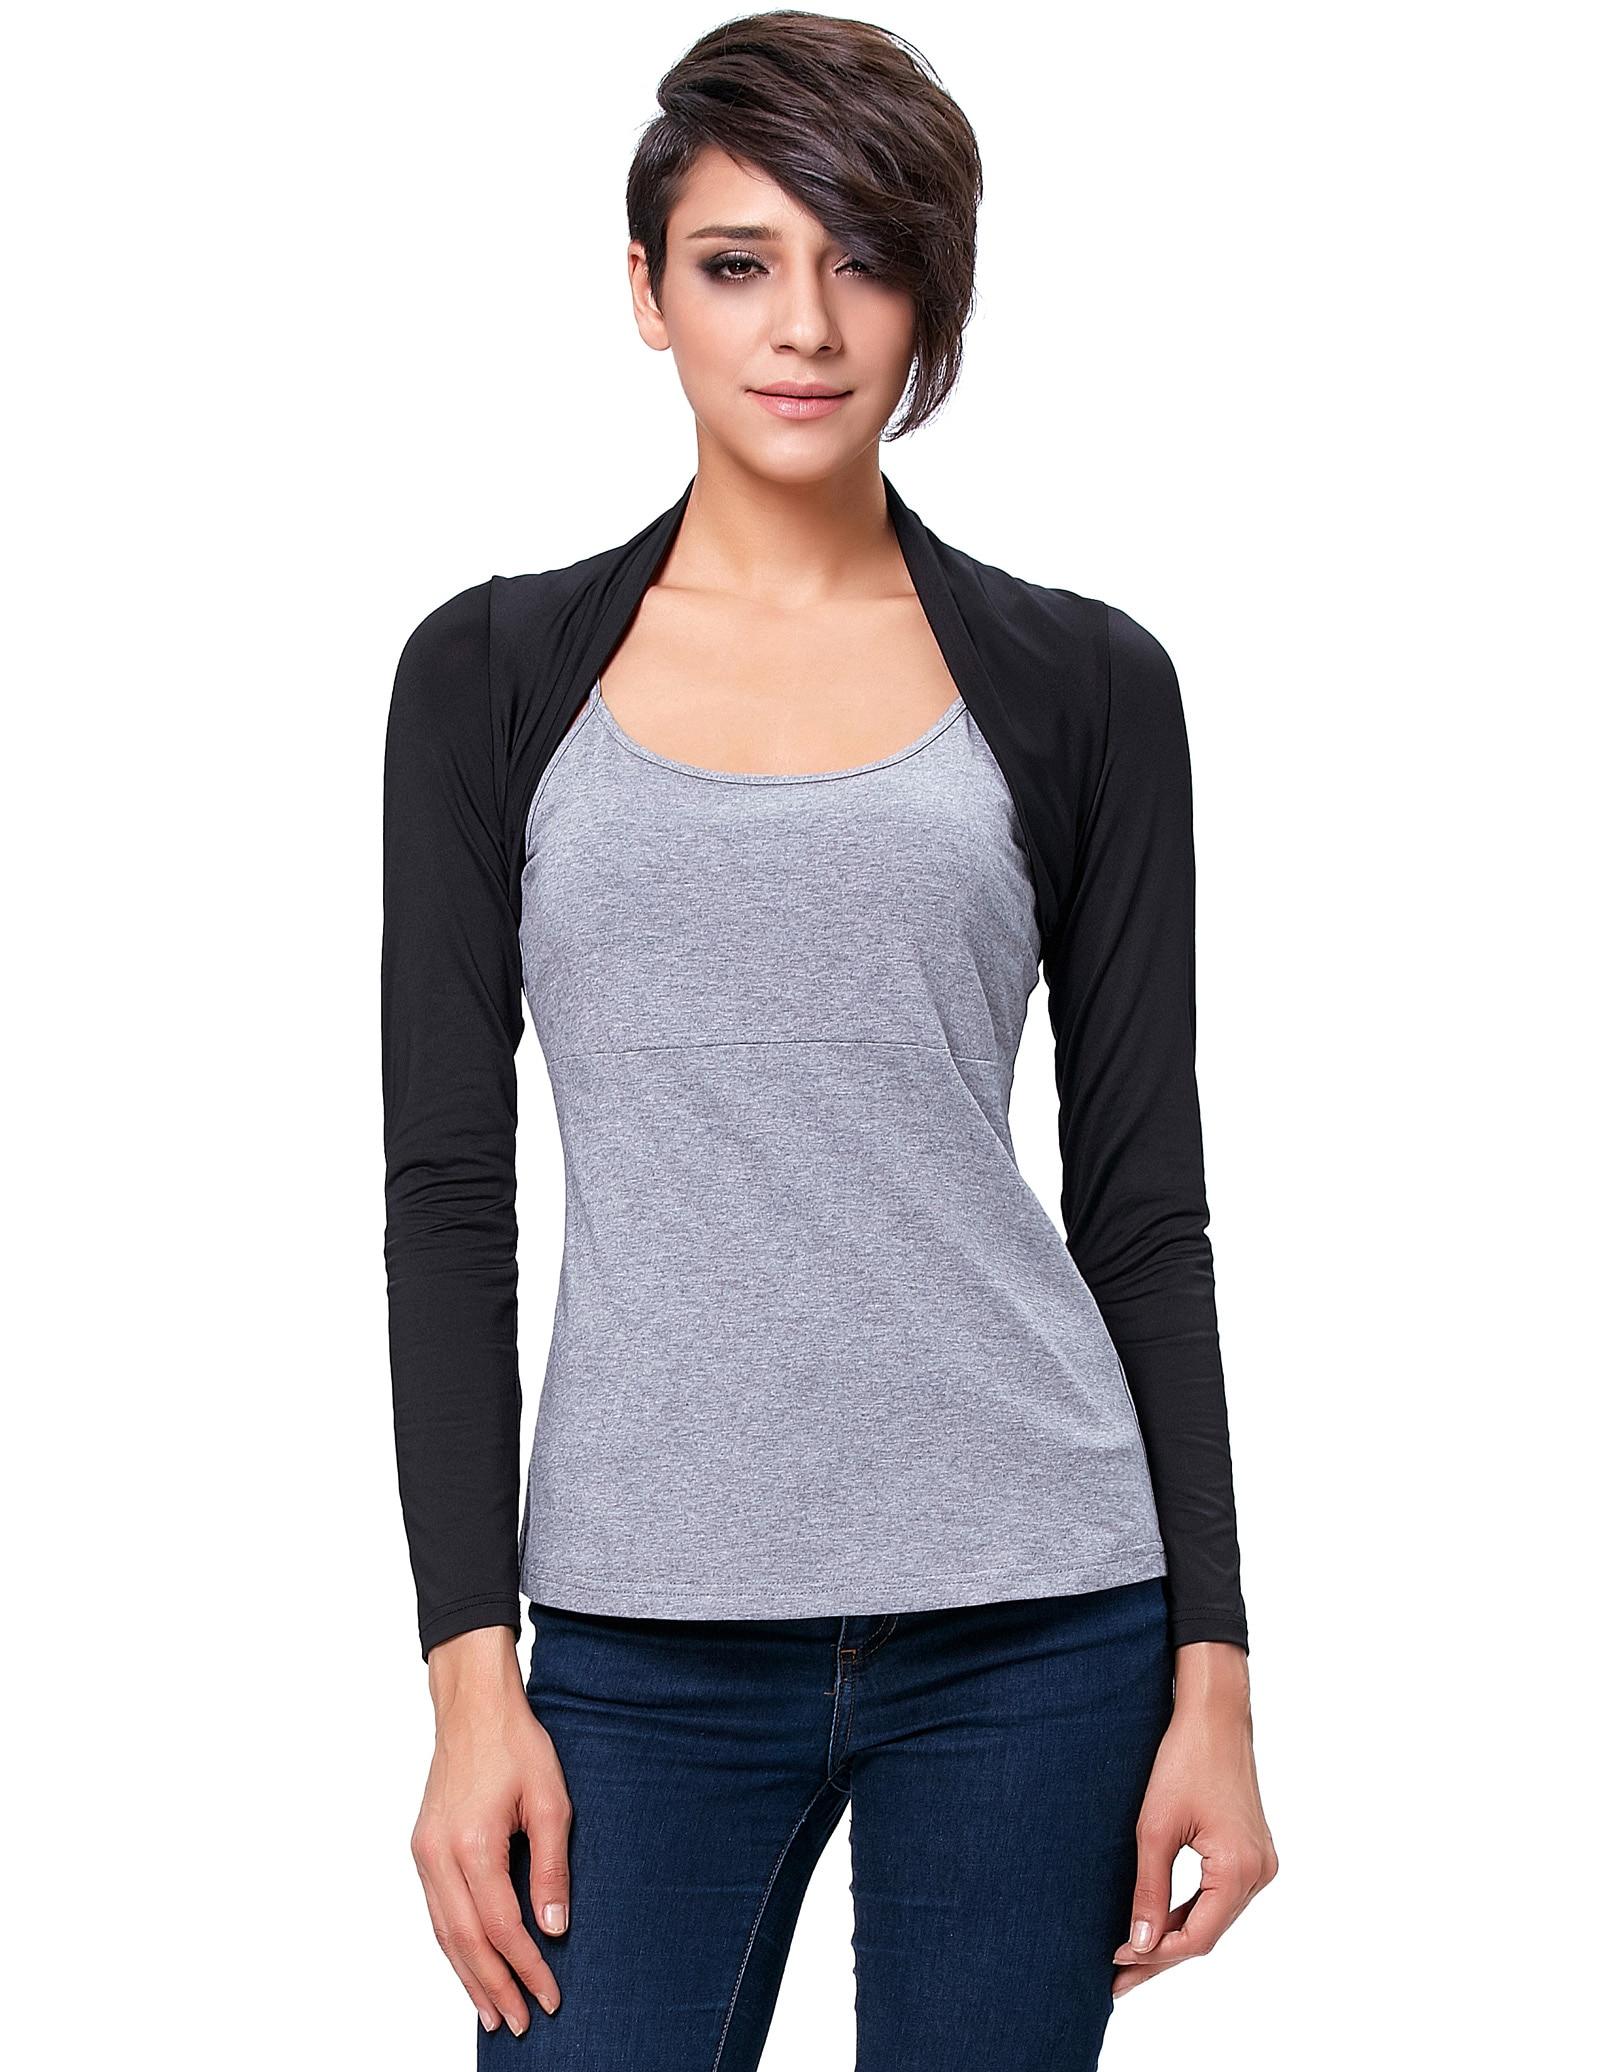 Women's Short Jacket Long Sleeve Comfortable Modal Bolero Shrug Lightweight Soft High Stretchy Summer Women Coat